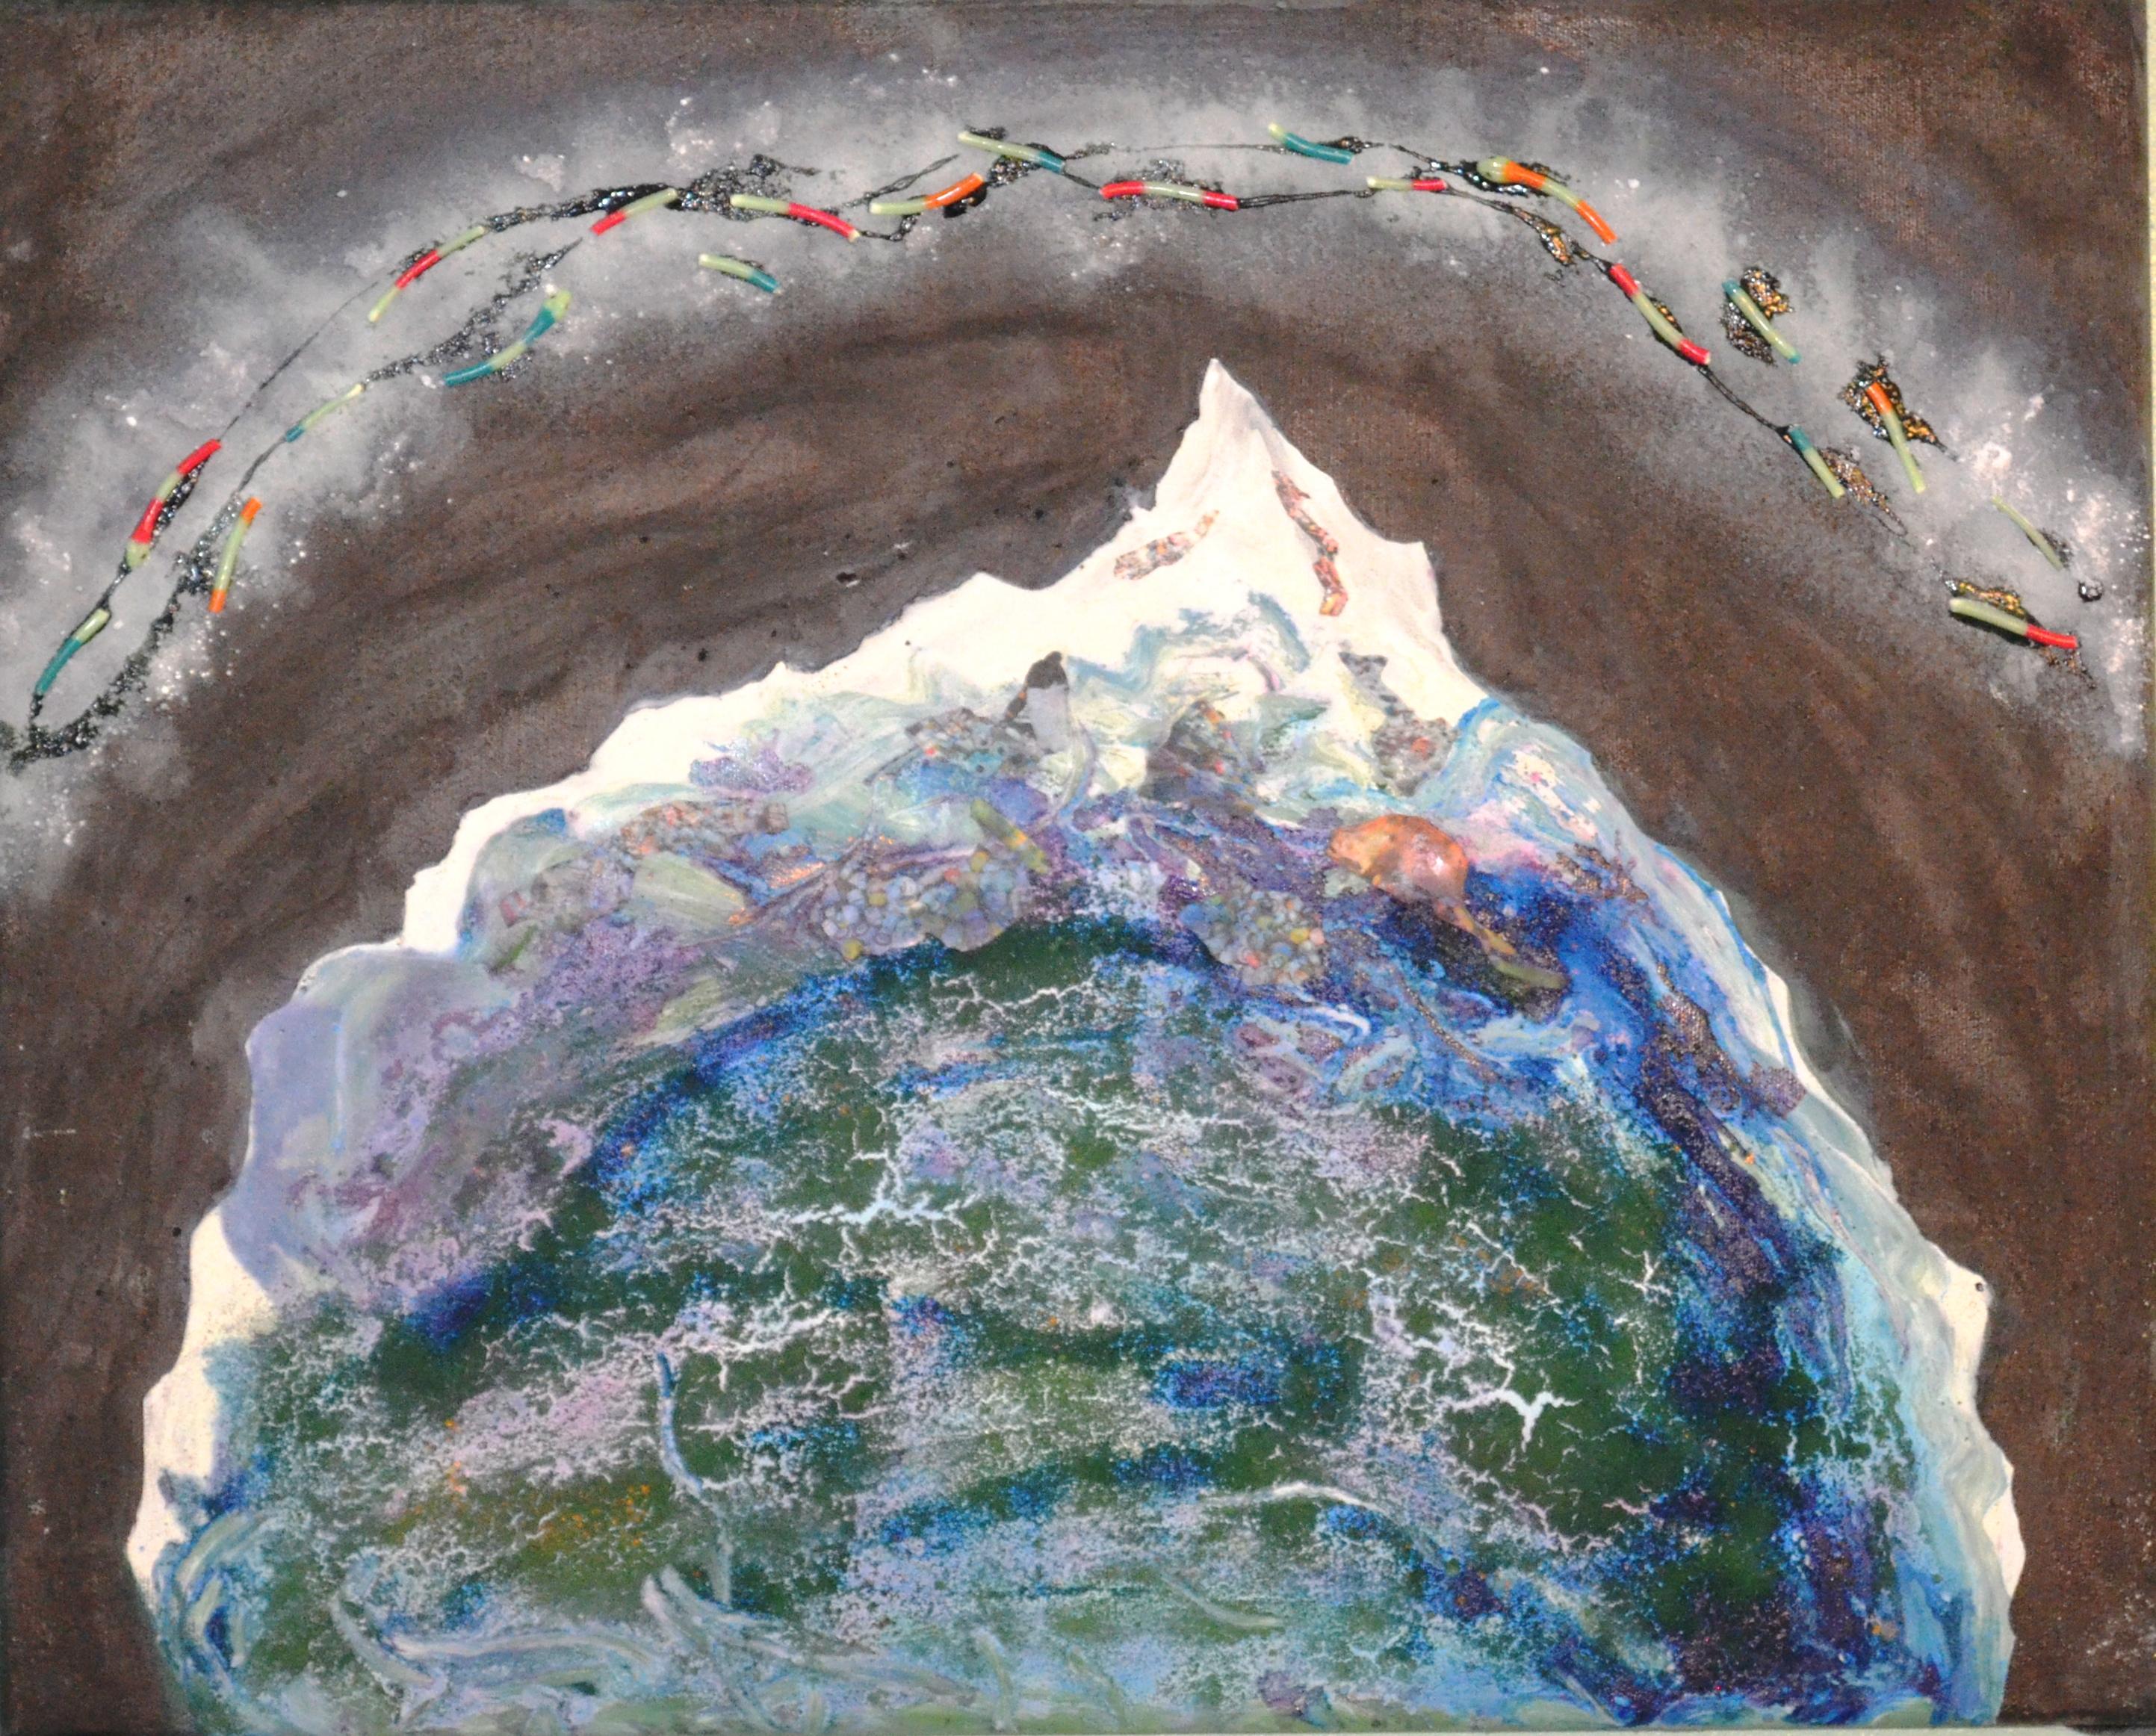 Mount Everest Debris Field Attempts to Reach Space Debris Field